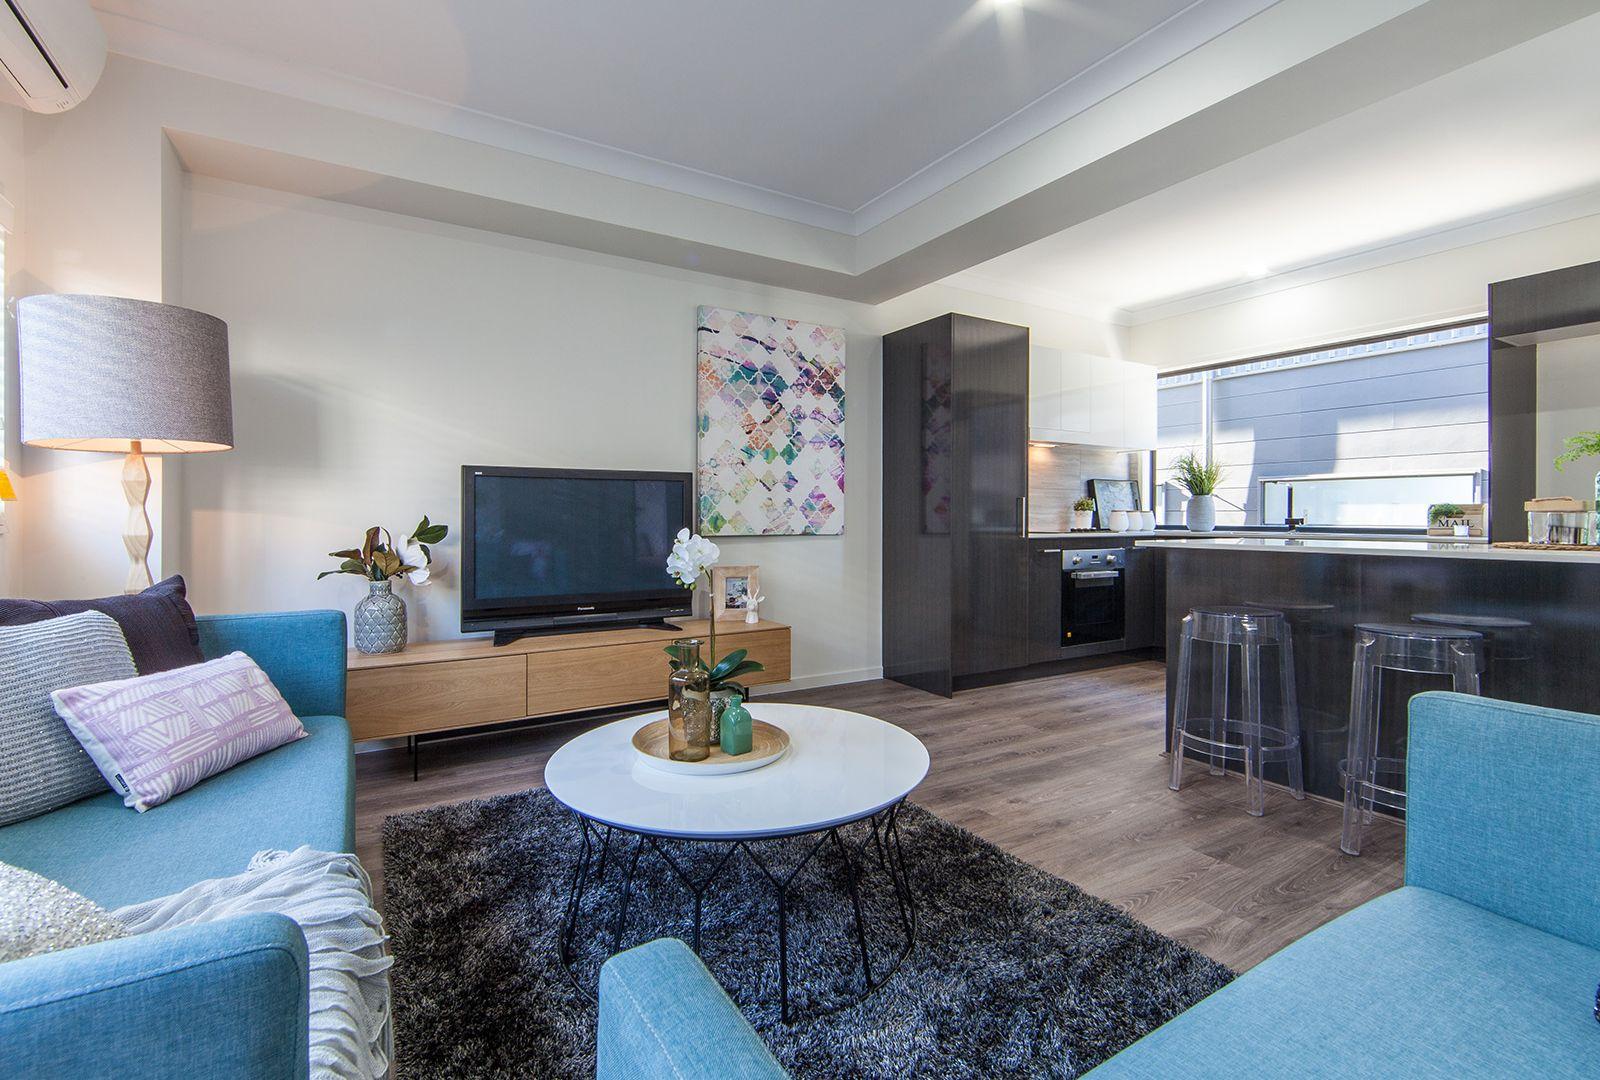 2/37 Rawlinson Street, Murarrie QLD 4172, Image 2